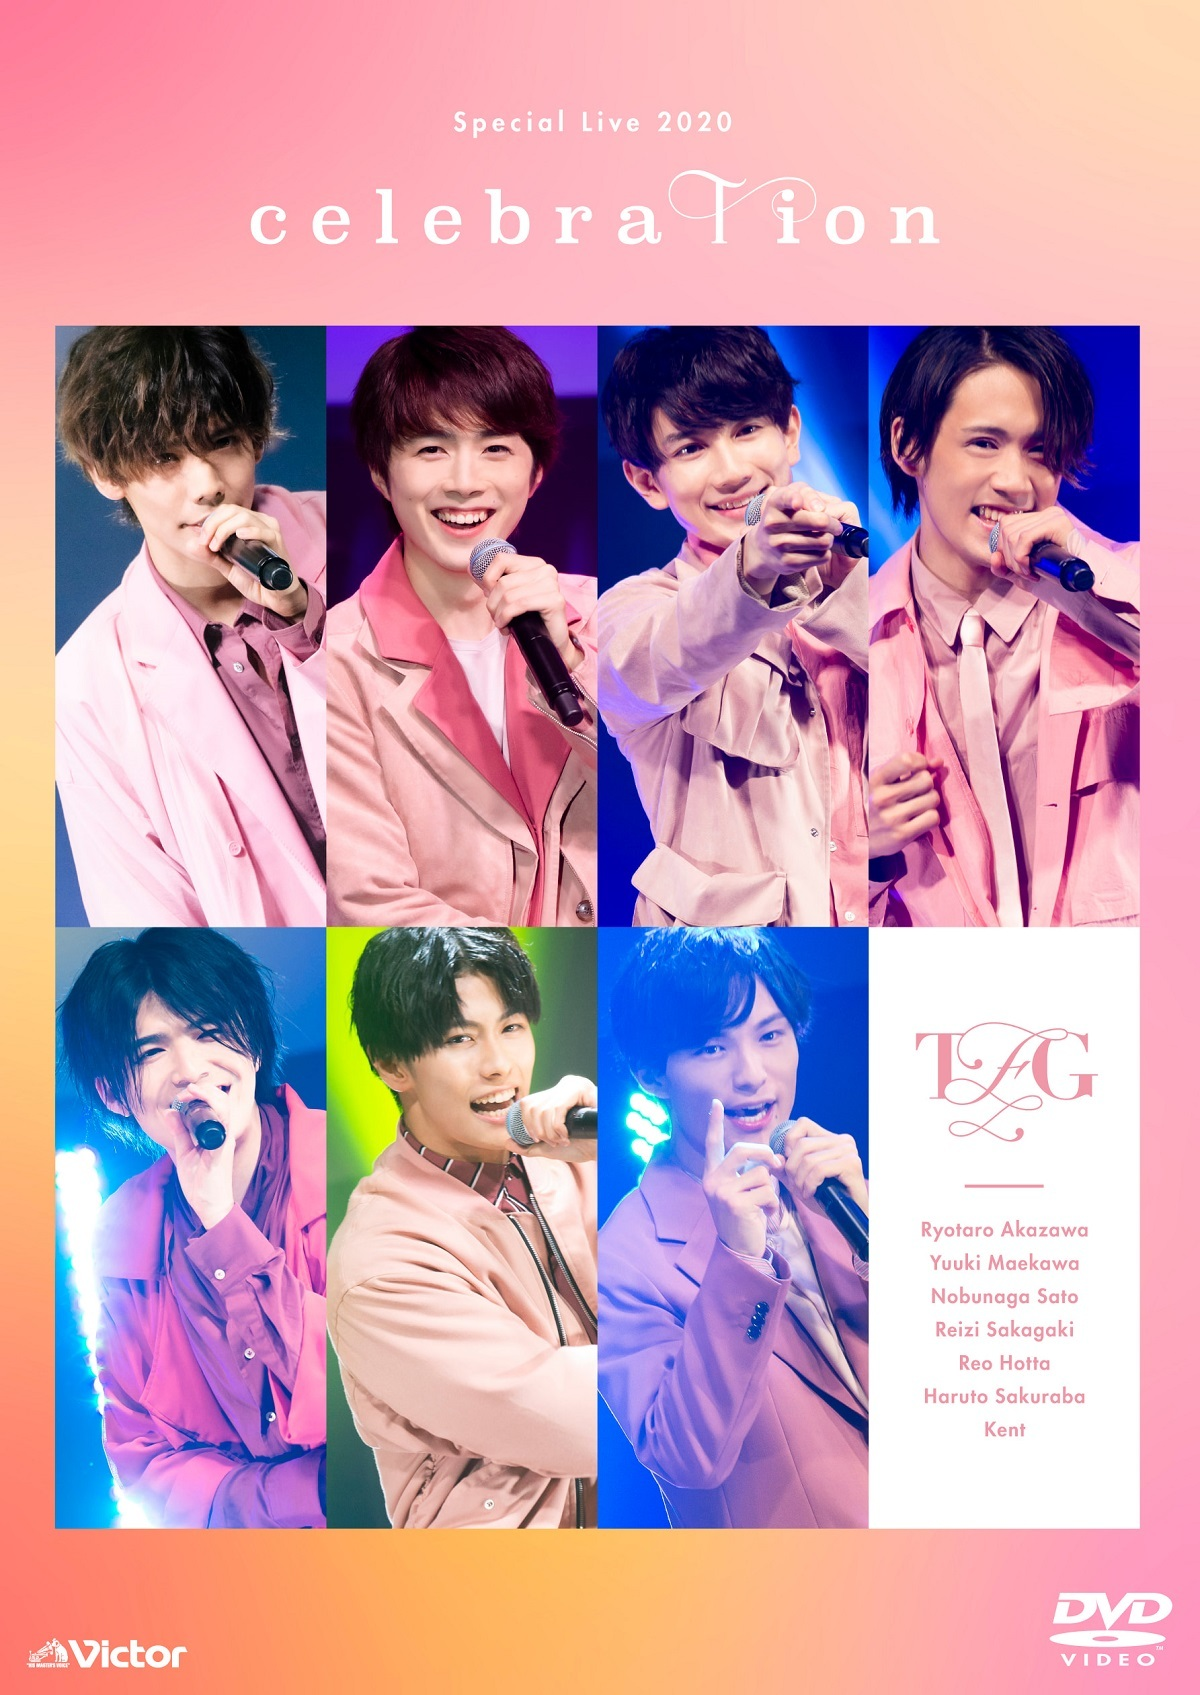 TFG『Special Live 2020 -celebraTion-』DVD